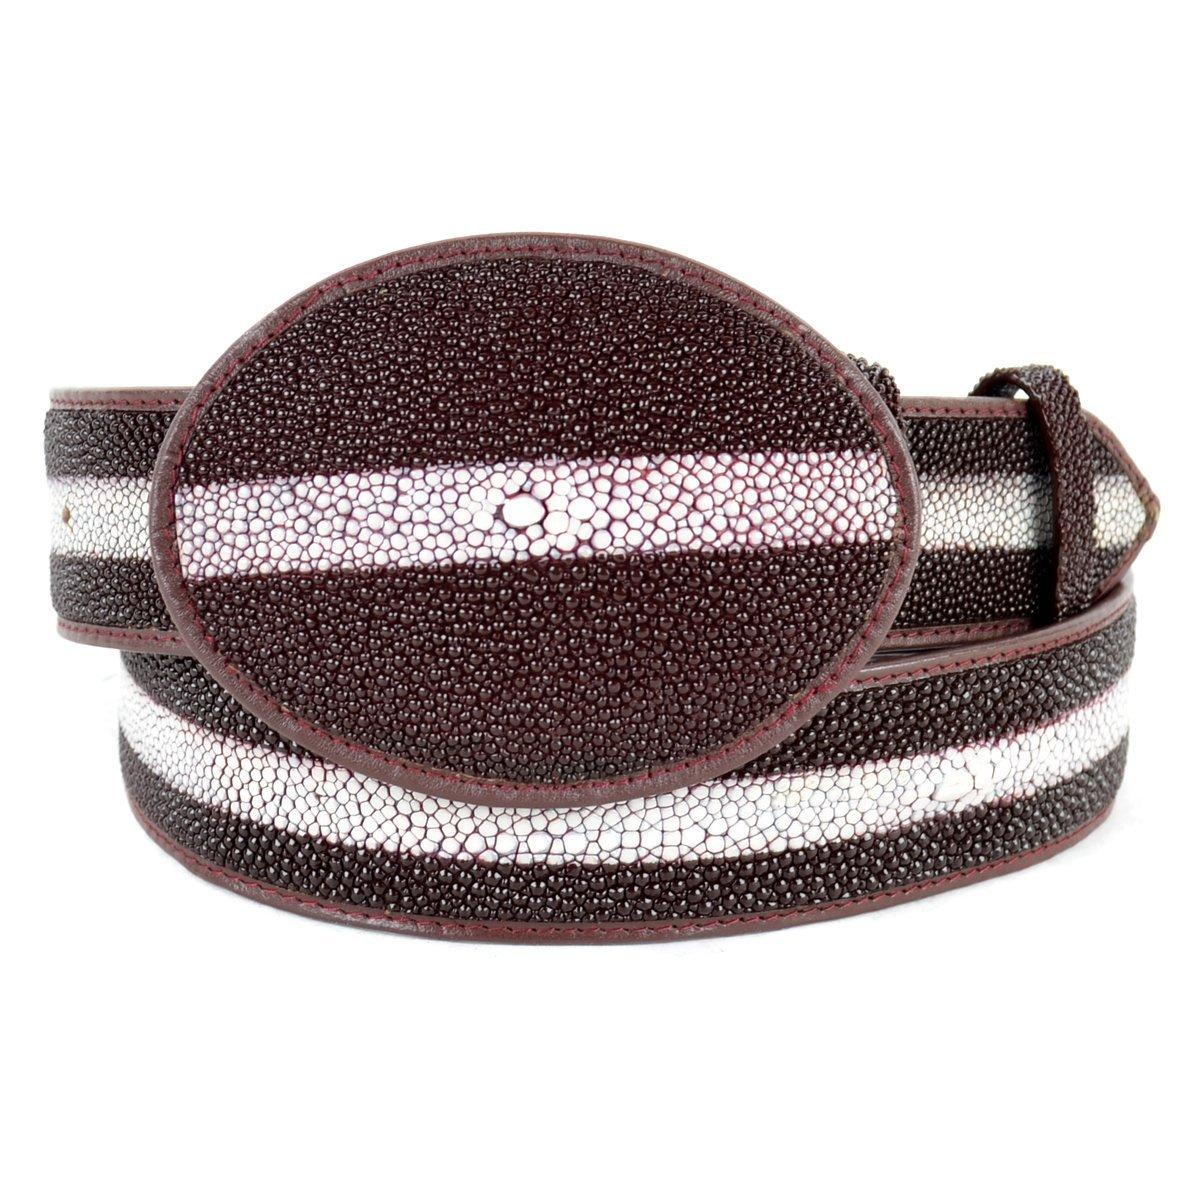 Original Burgundy Rowstone Finish StingRay Skin Western Style Belt